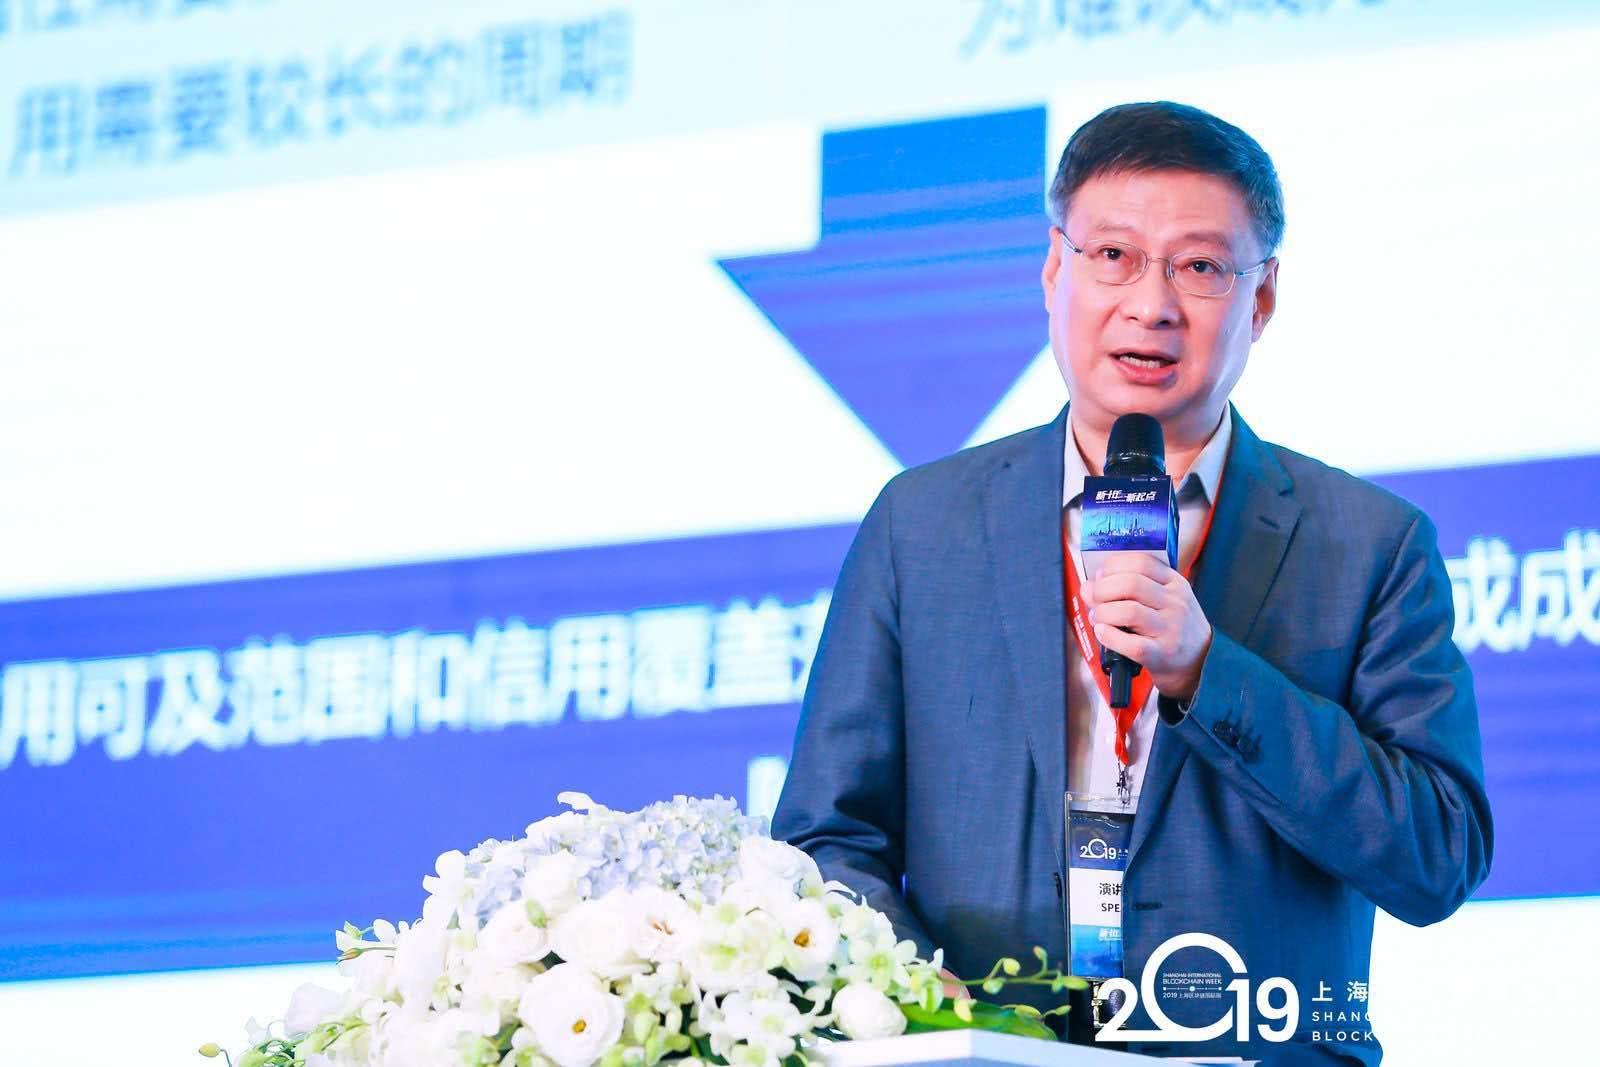 http://www.reviewcode.cn/shujuku/76400.html